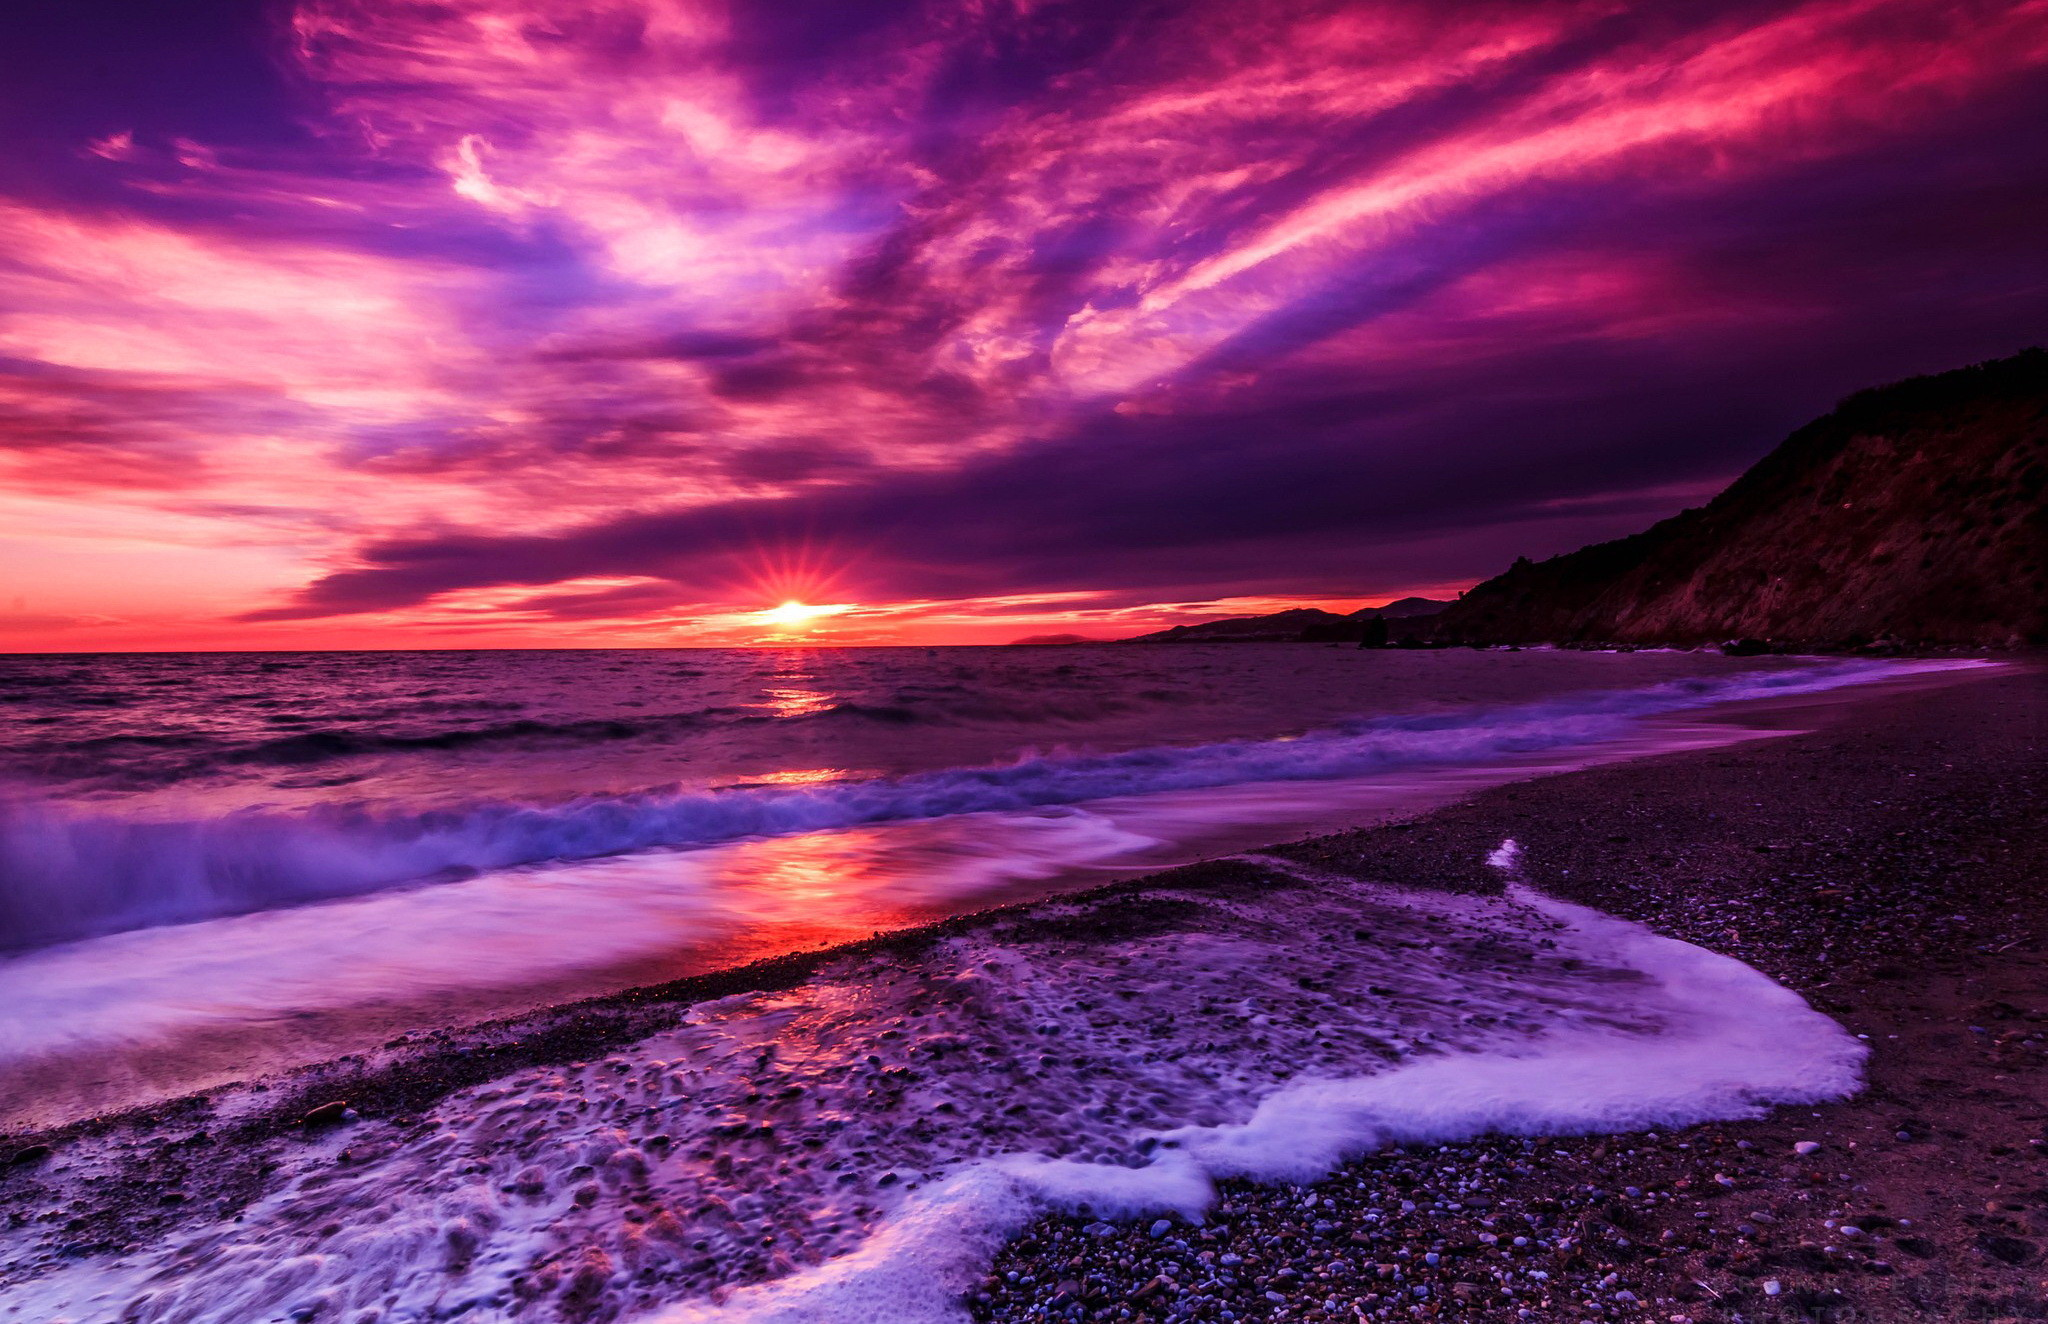 Purple Desktop Wallpaper (60+ images)